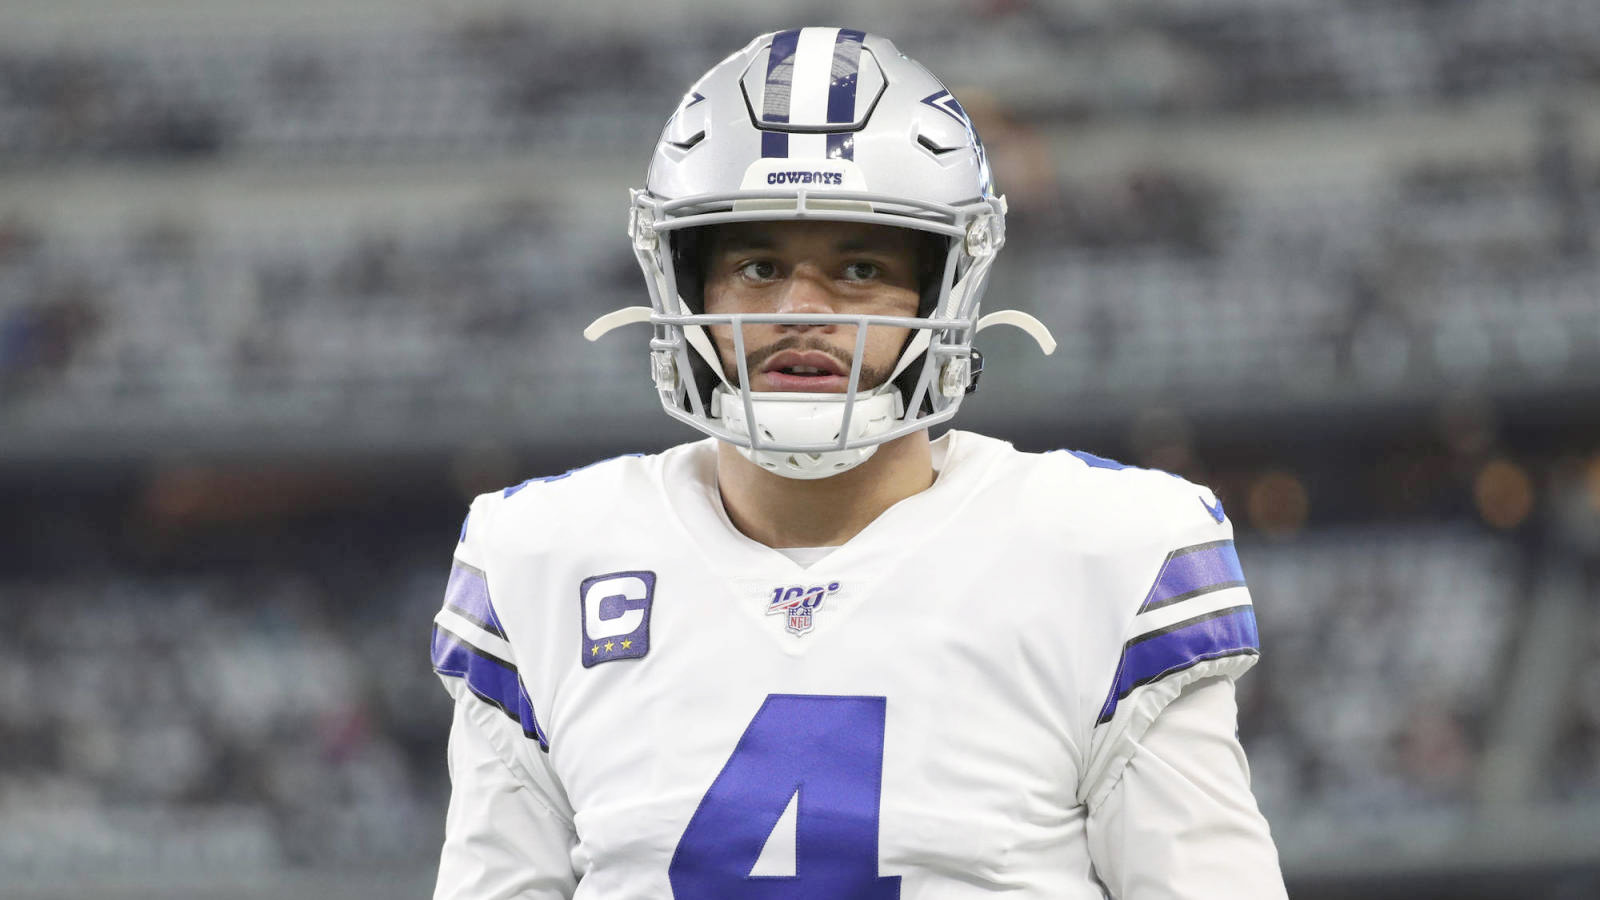 Dec 29, 2019; Arlington, Texas, USA;  Dallas Cowboys quarterback Dak Prescott (4) before the game against the Washington Redskins at AT&T Stadium. Mandatory Credit: Kevin Jairaj-USA TODAY Sports